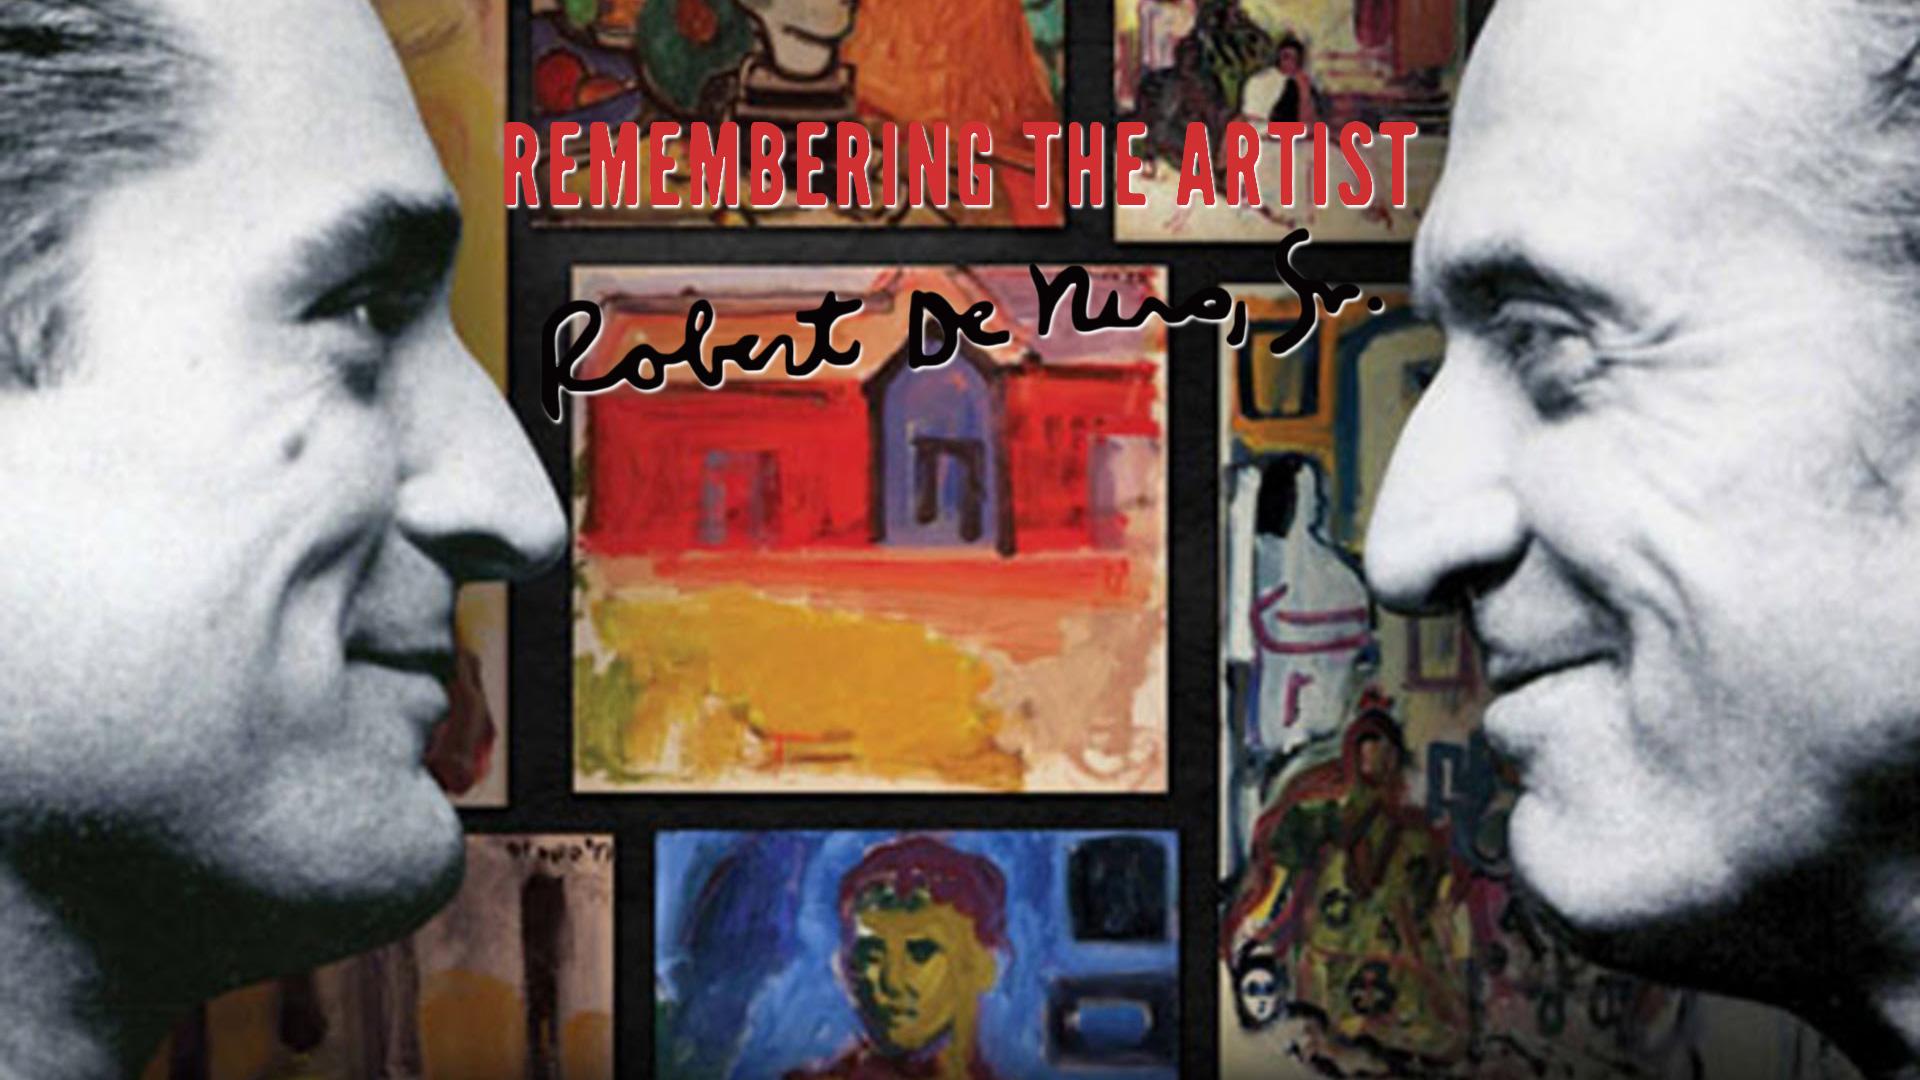 Remembering the Artist Robert De Niro, Sr.